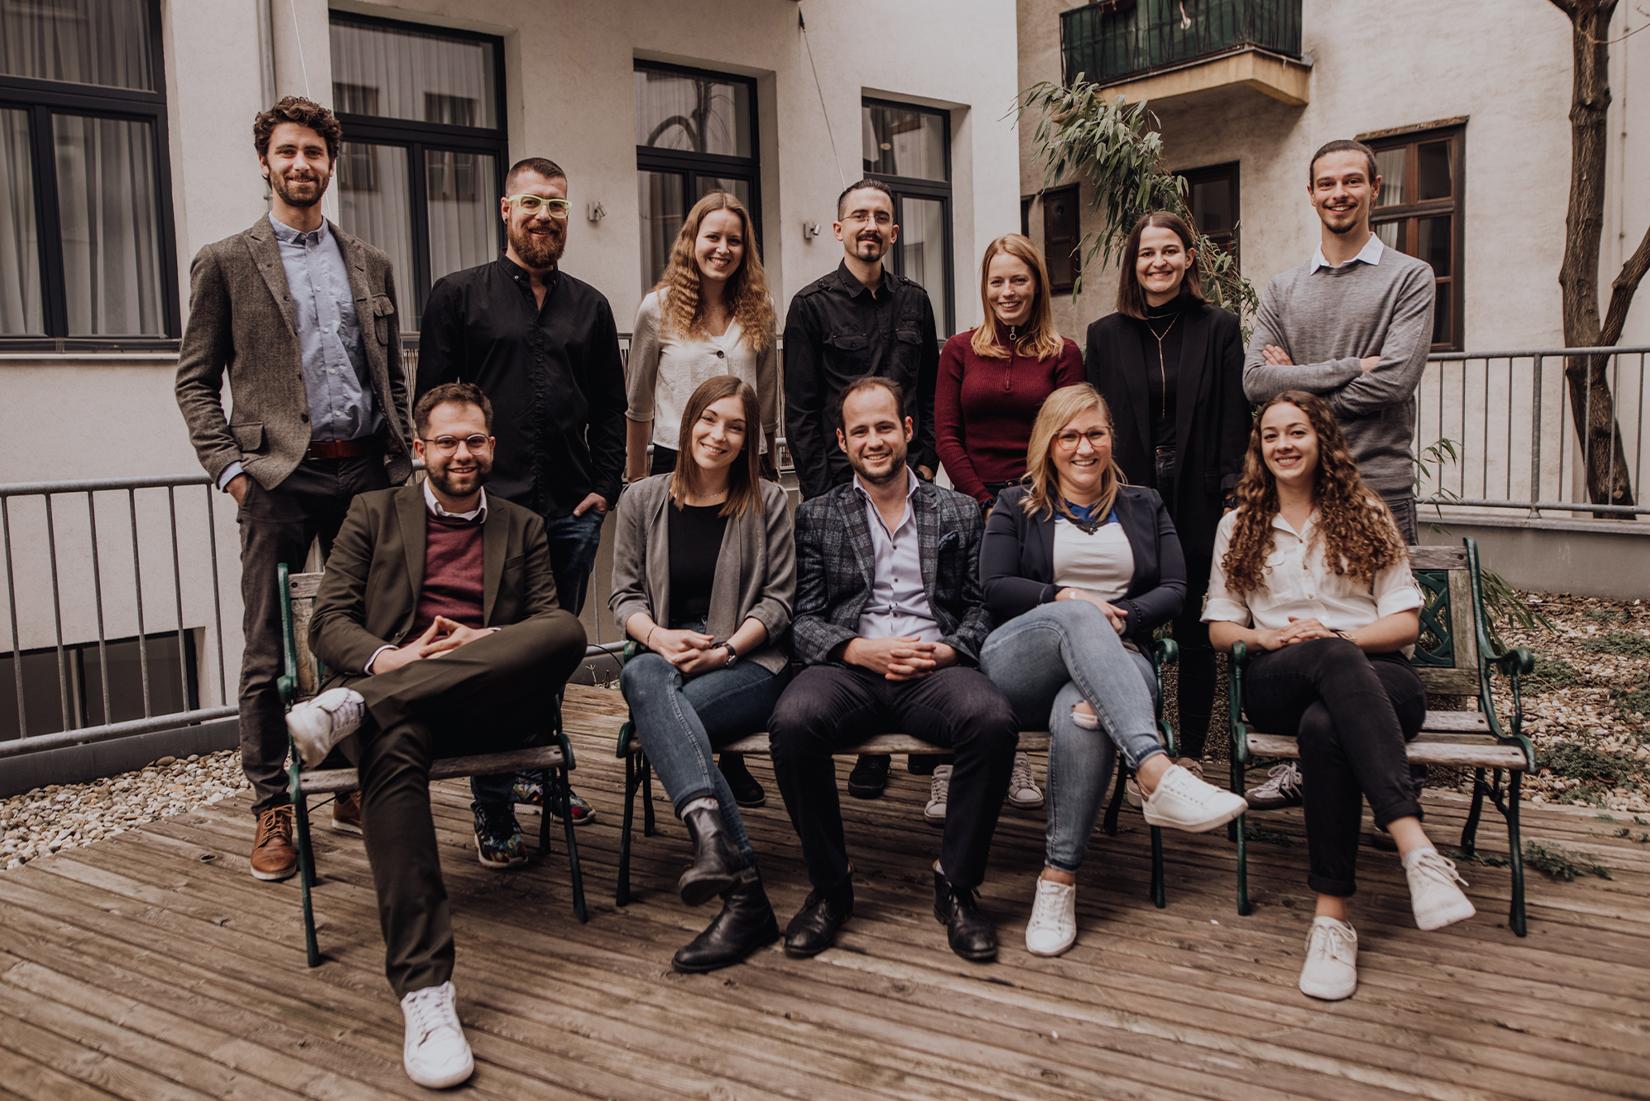 Strolzevent GmbH, Team